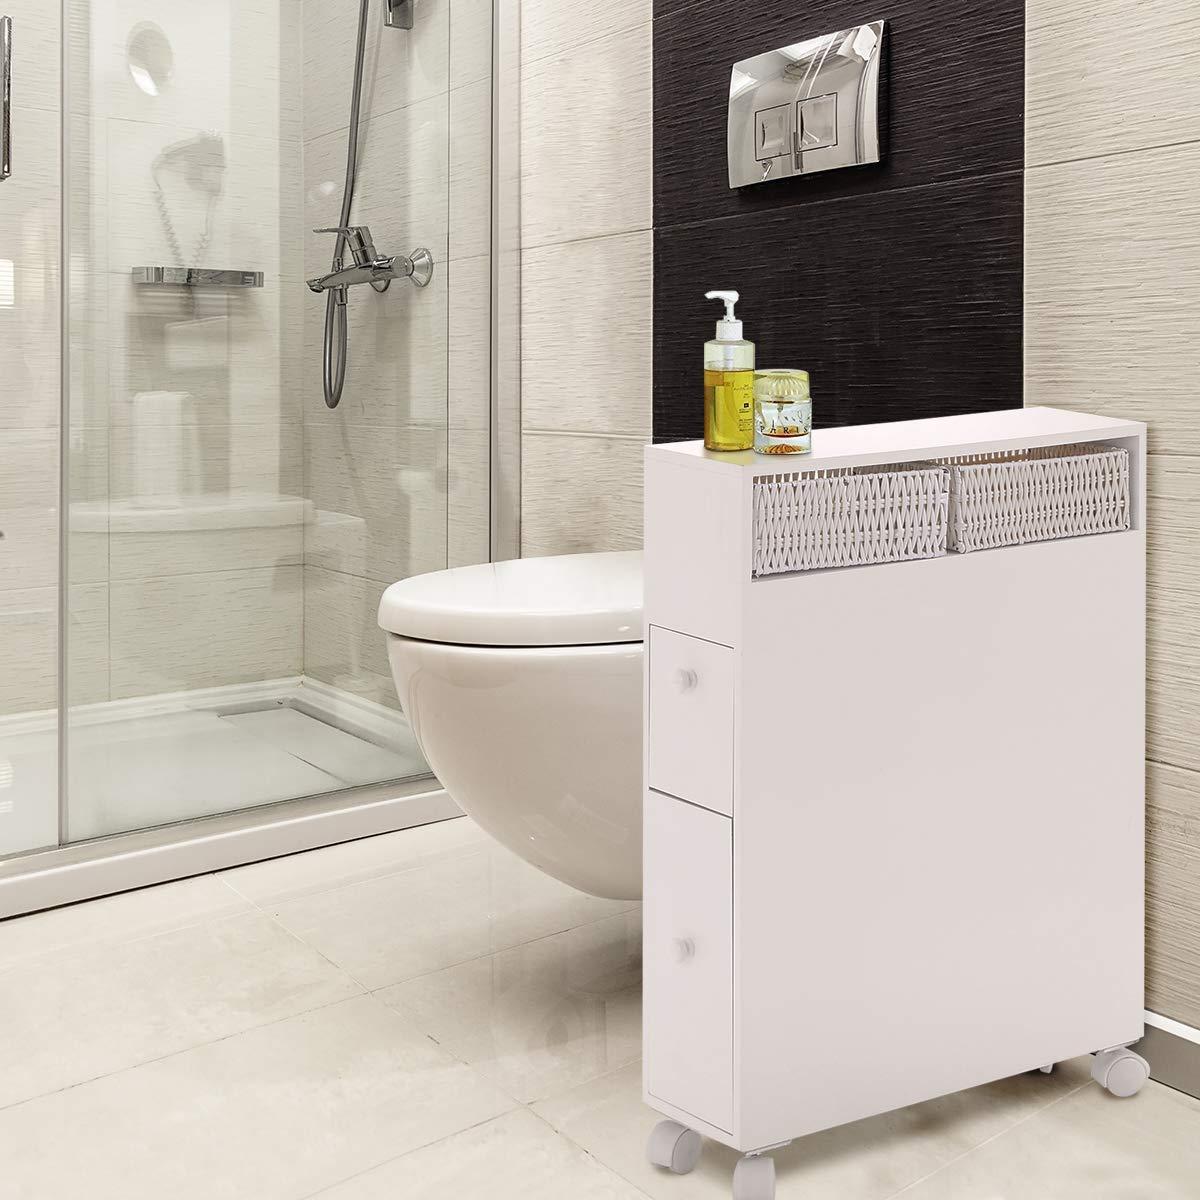 Tangkula Bathroom Storage Wood Bathroom Rolling Floor Cabinet Wooden Floor Home Bath Toilet Organizer Floor Storage Cabinet with Drawers and Baskets